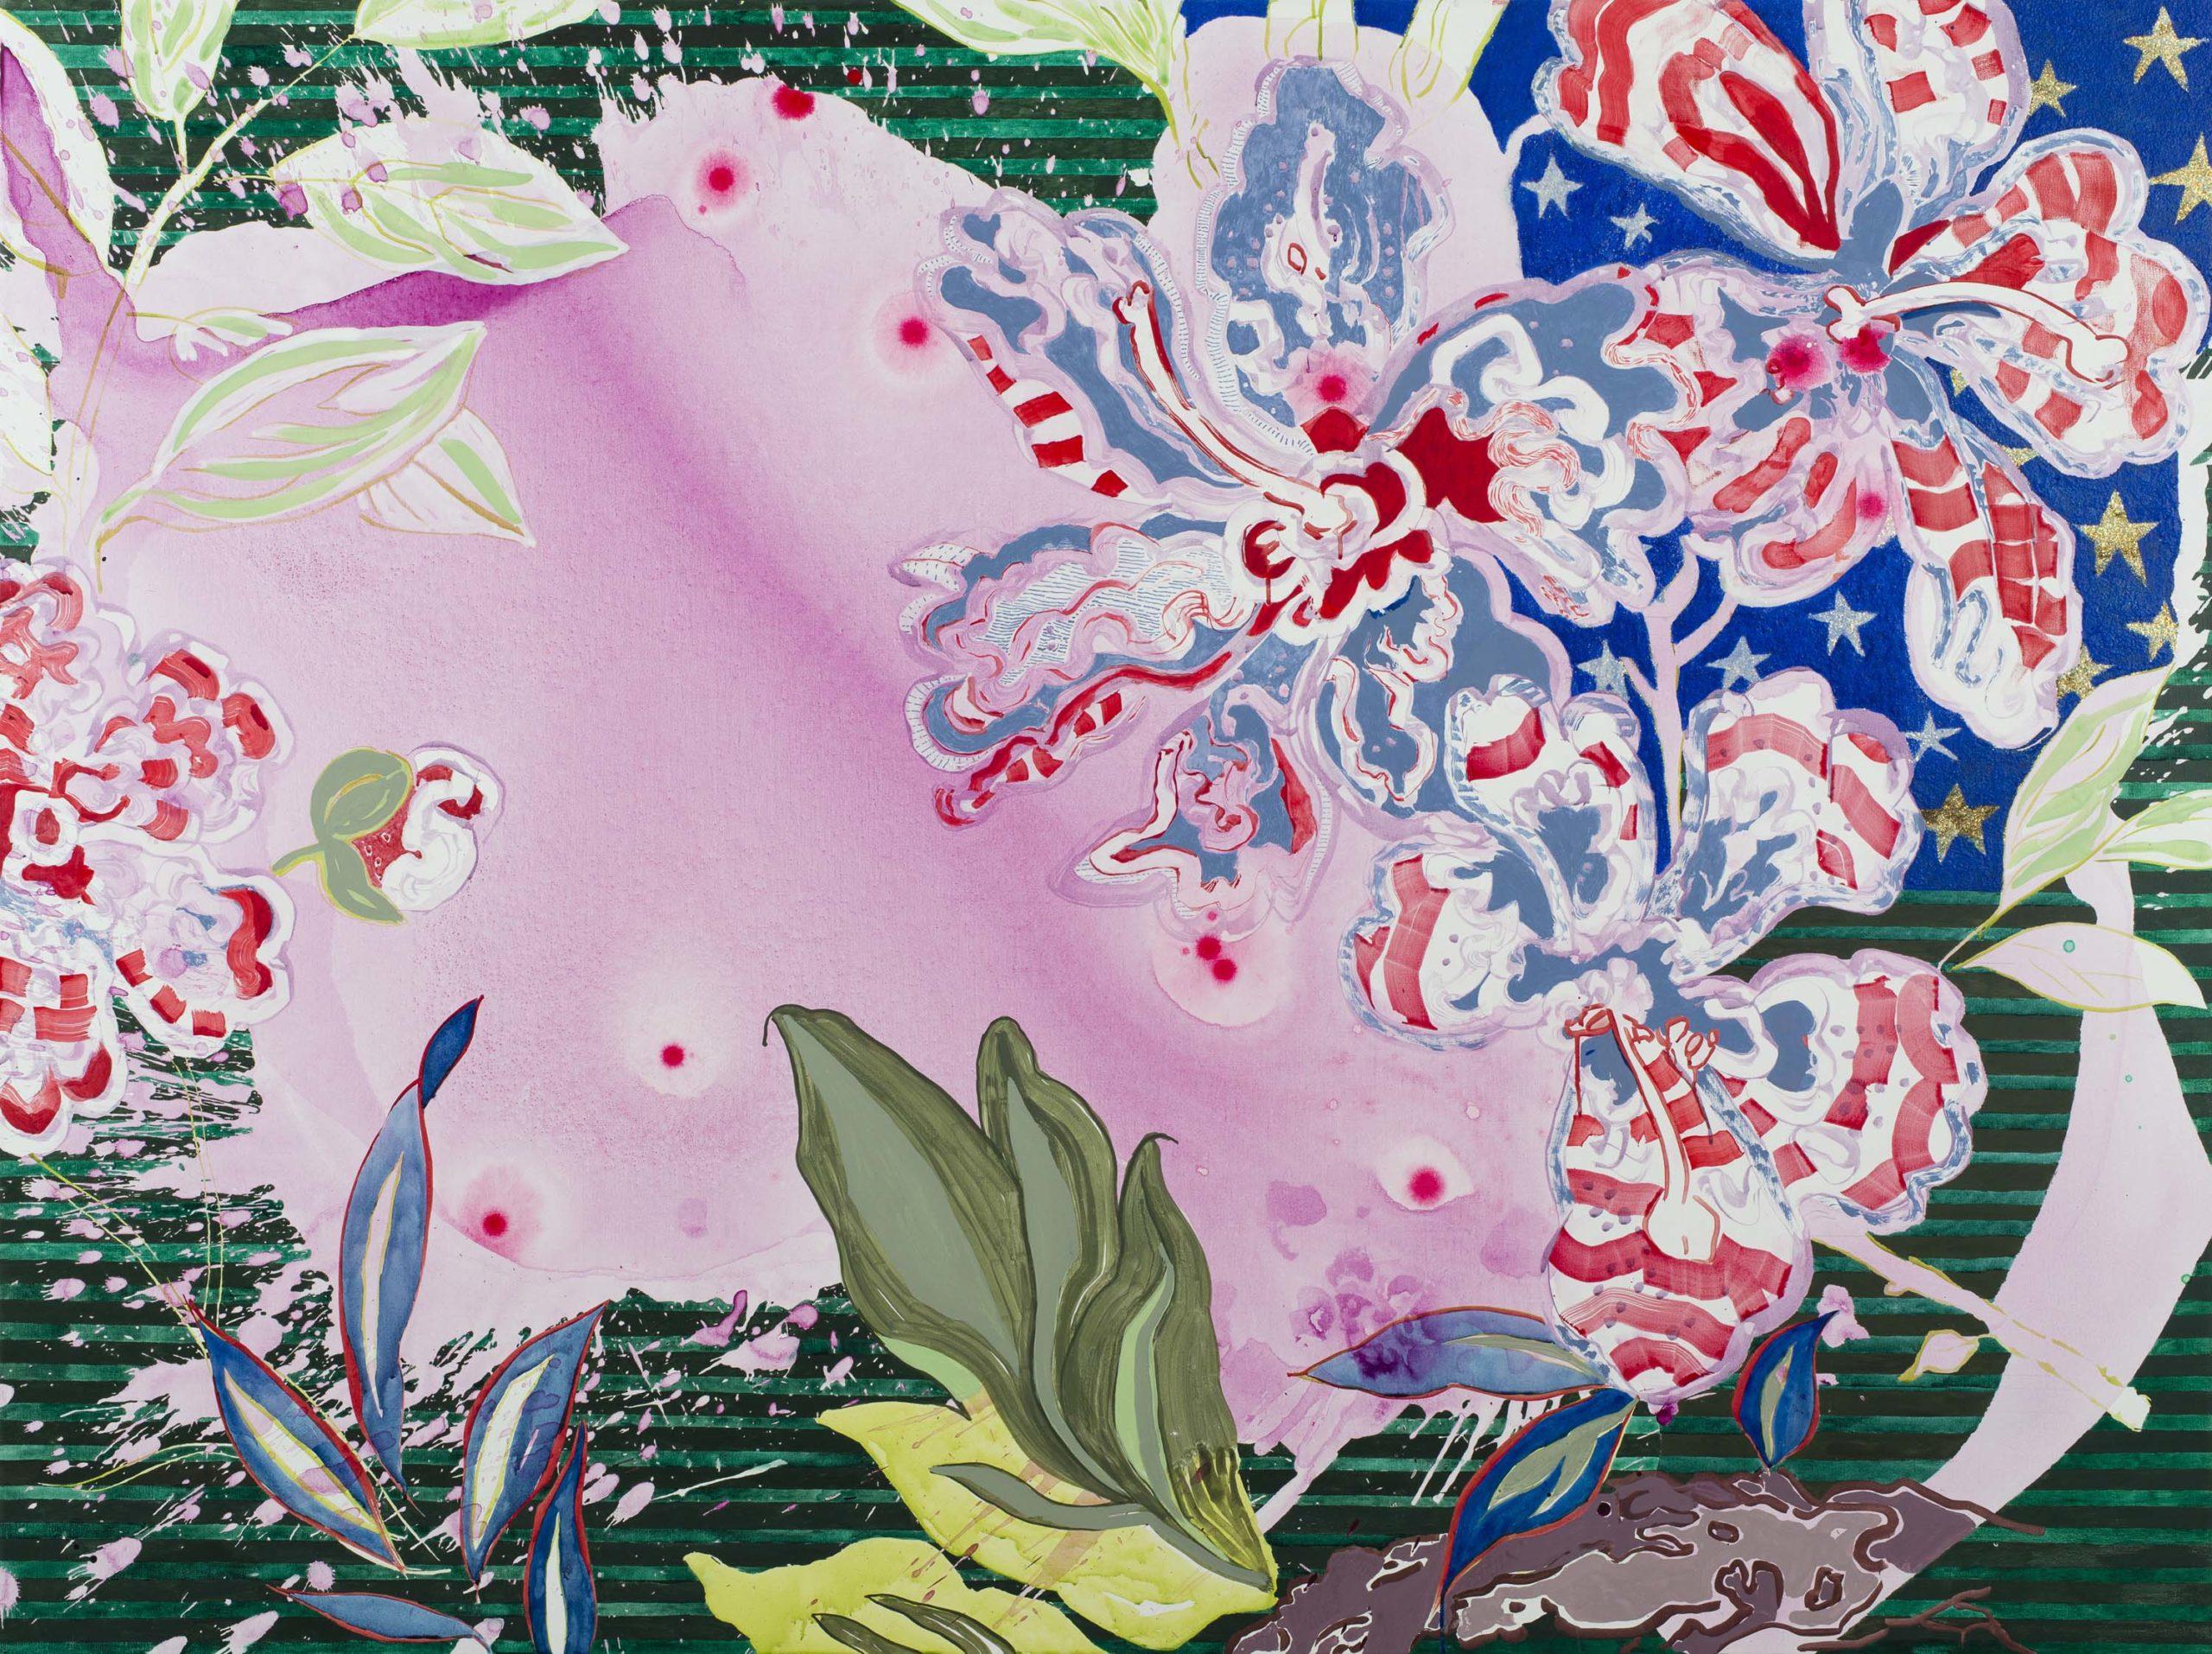 Elisabeth Condon, Love, American Style (detail), 2016